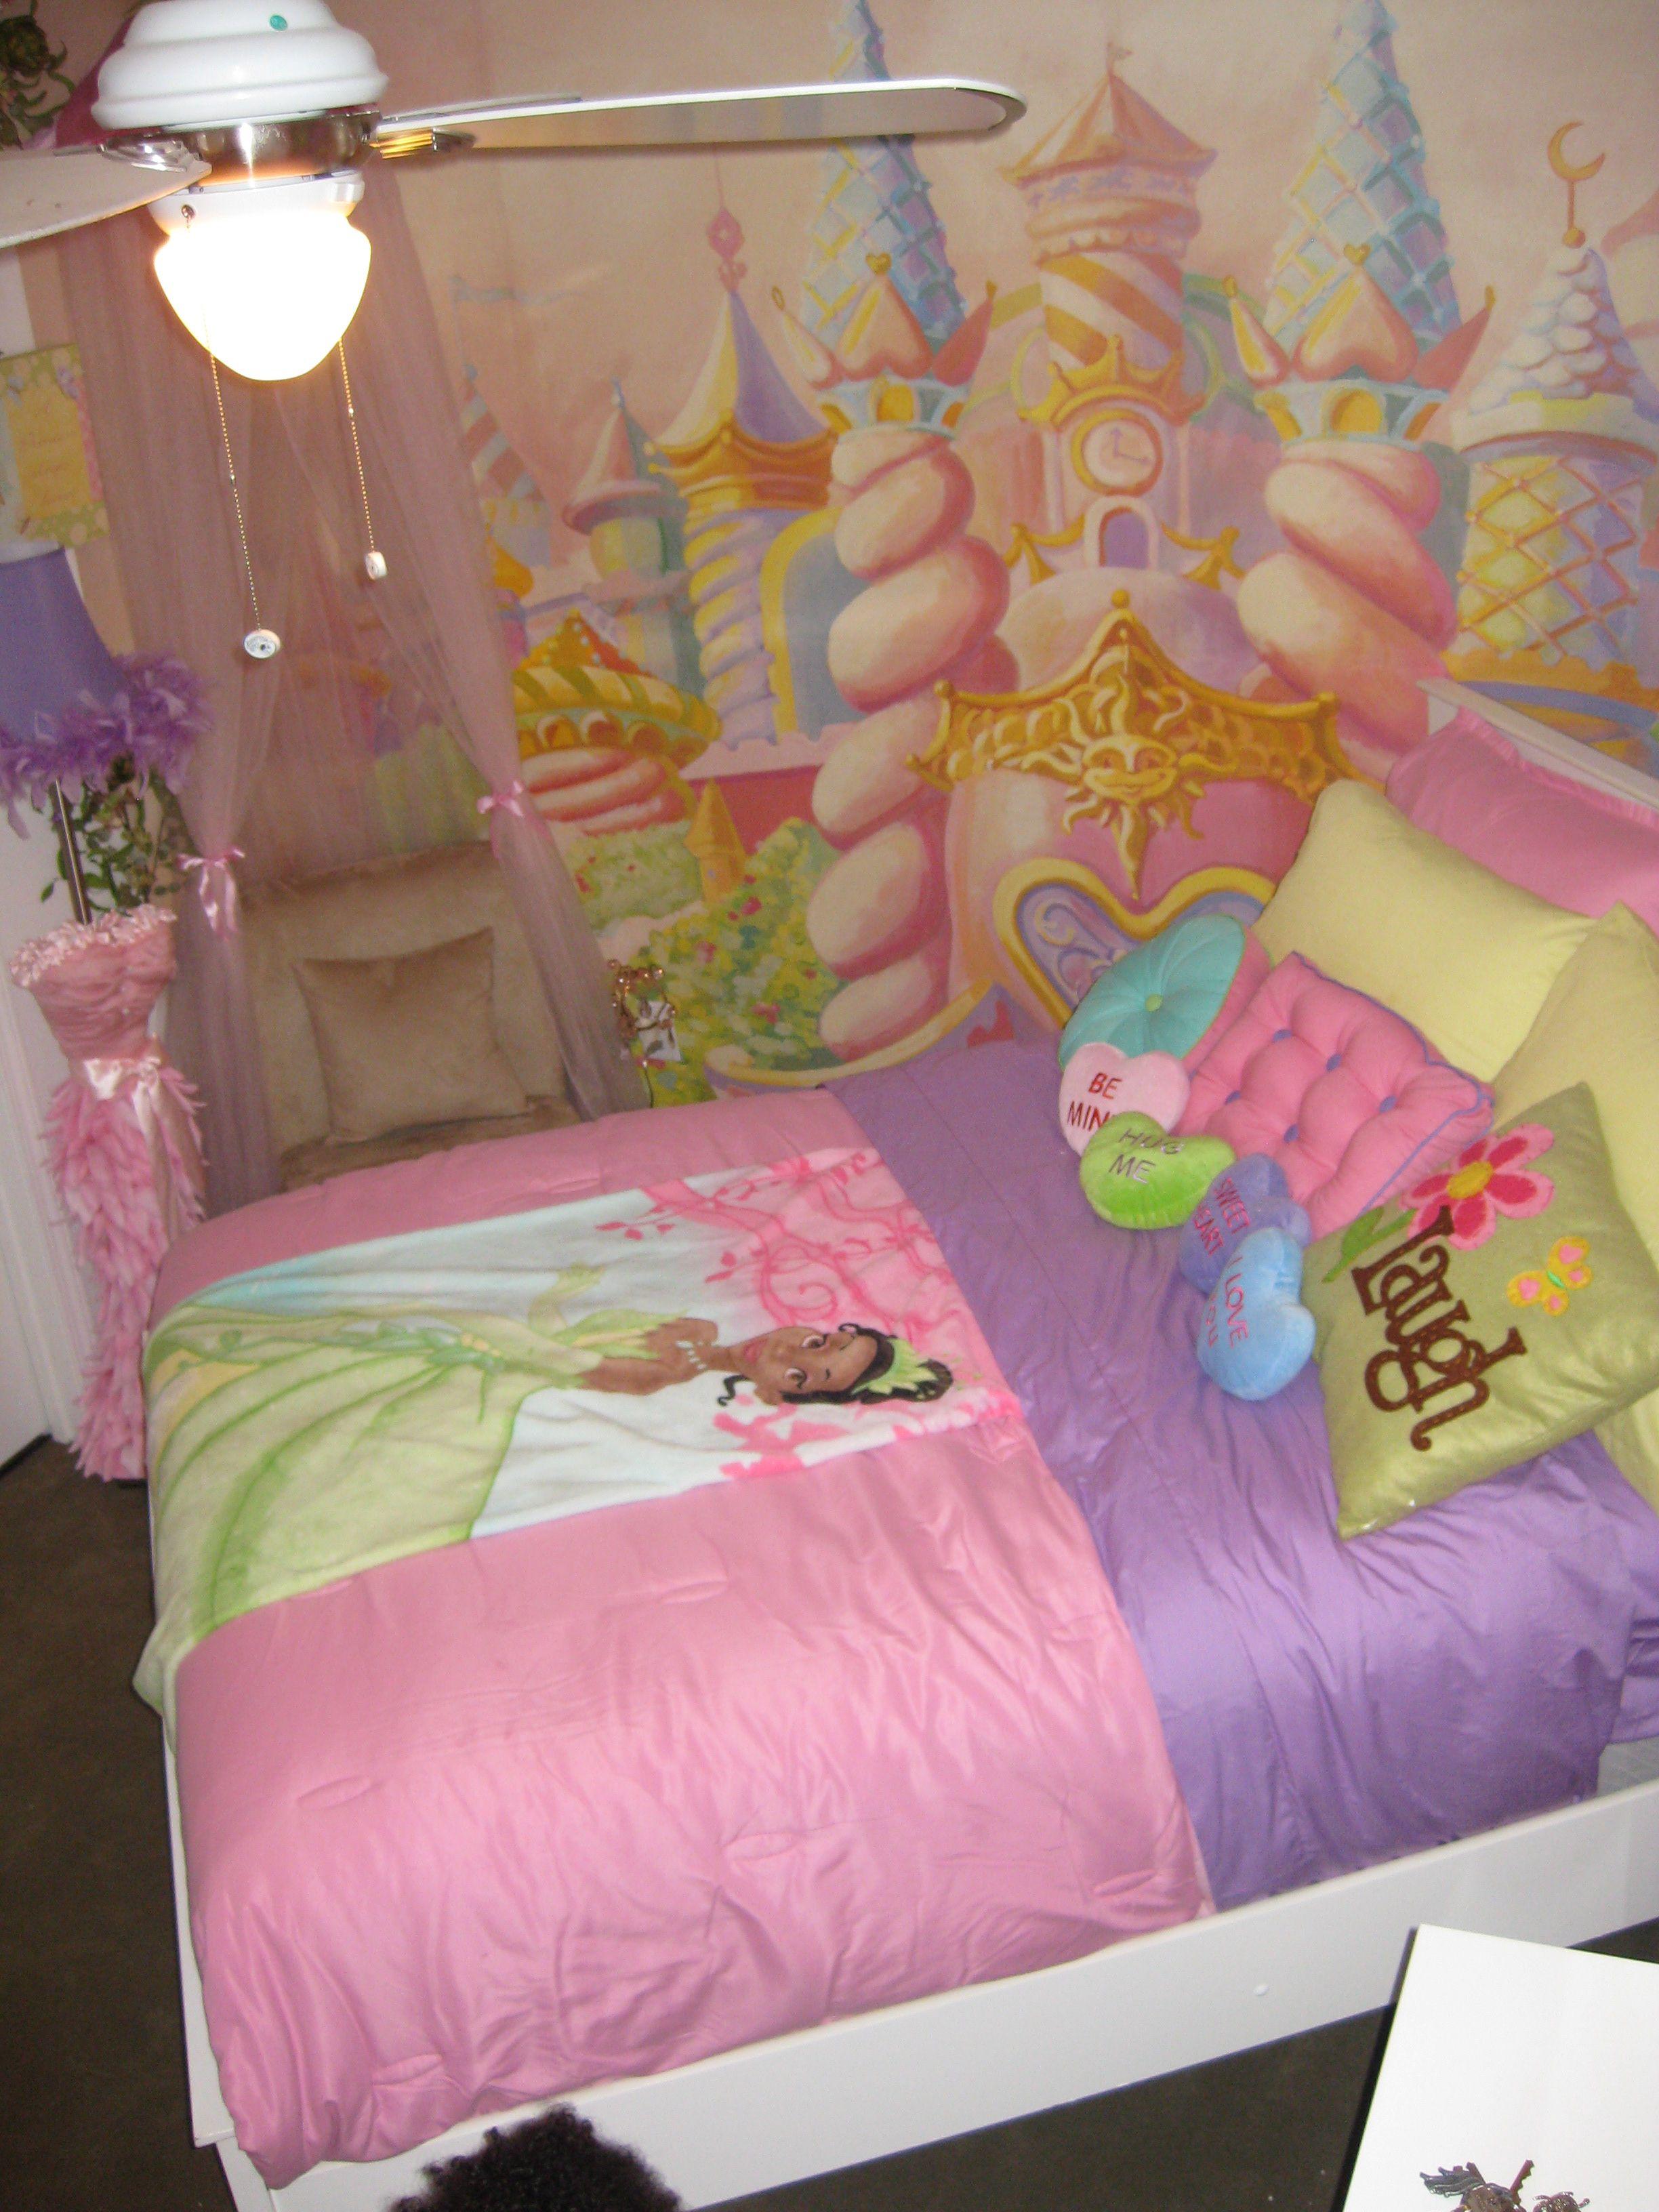 Princess BedRoom Done By Me... JMG | Princess bedrooms ...